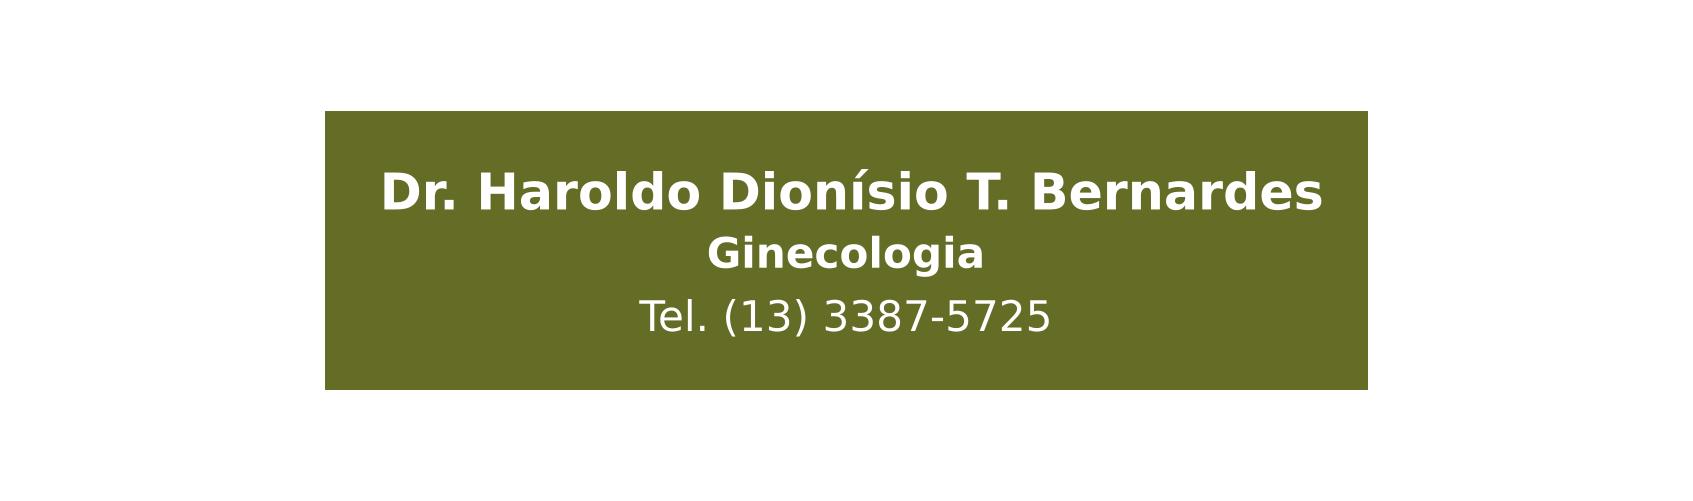 parceiros Haroldo Dionisio 170818